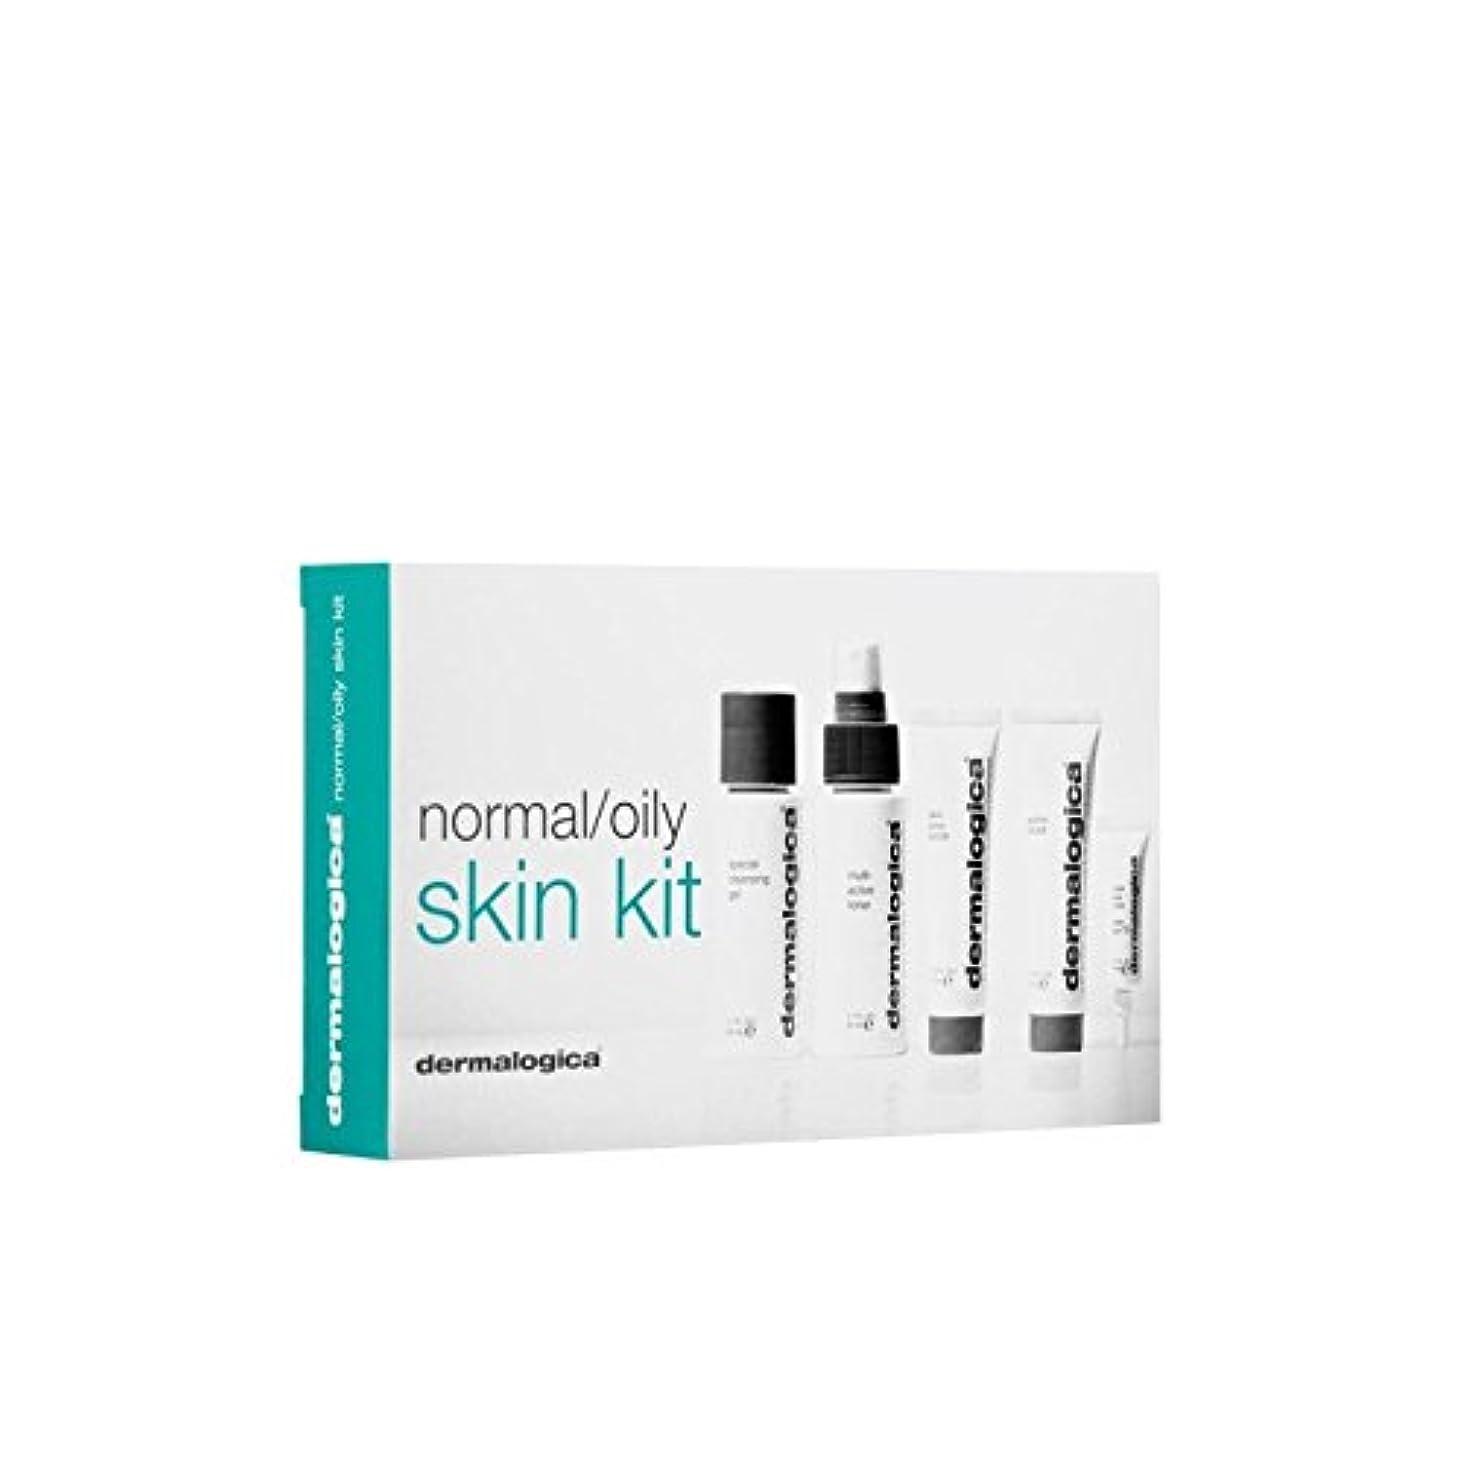 Dermalogica Skin Kit - Normal/Oily (5 Products) - ダーマロジカスキンキット - ノーマル/オイリー(5製品) [並行輸入品]